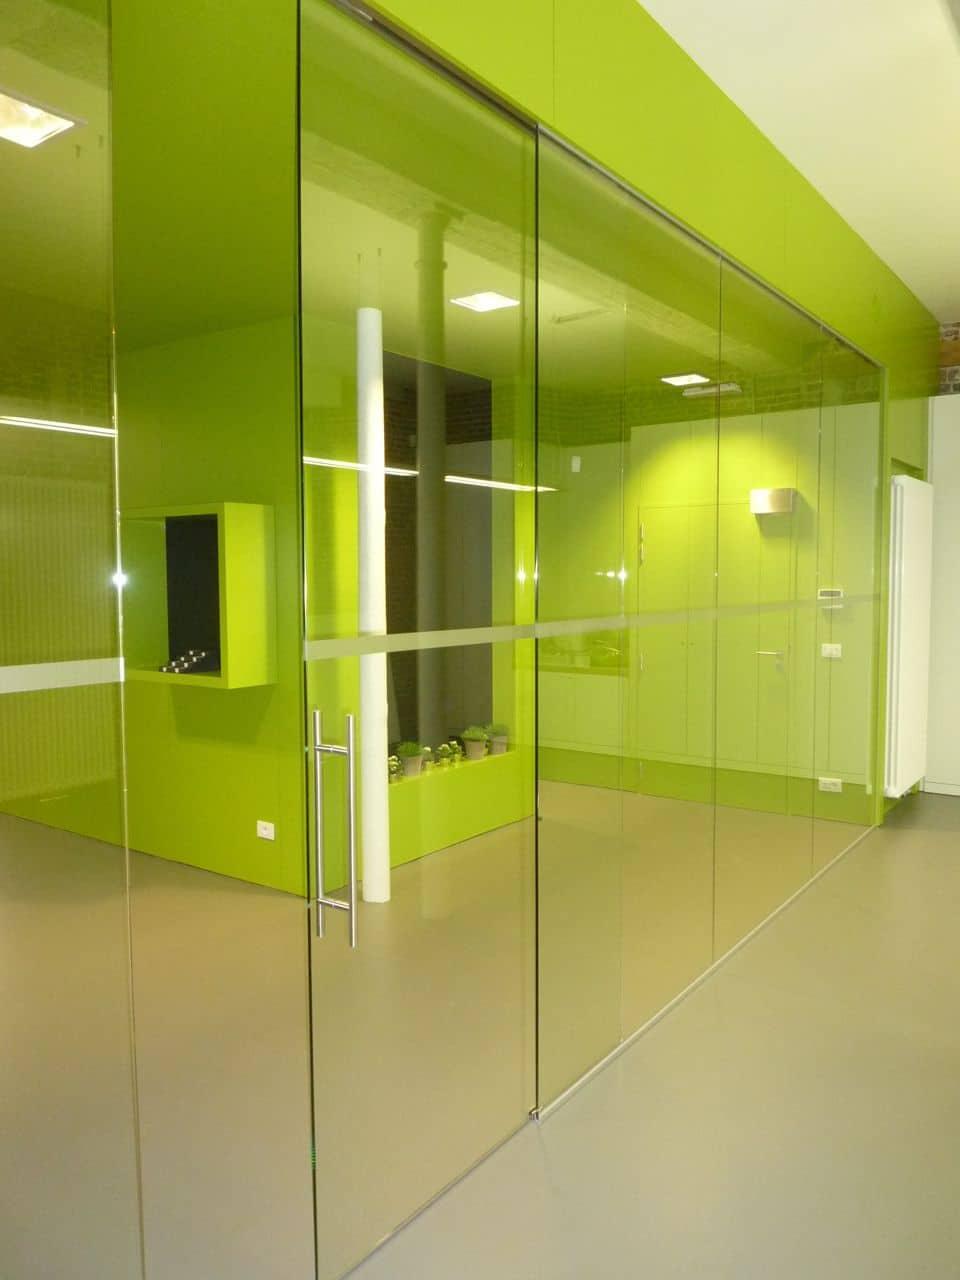 P1060752 | Baeyens & Beck architecten Gent | architect nieuwbouw renovatie interieur | high end | architectenbureau